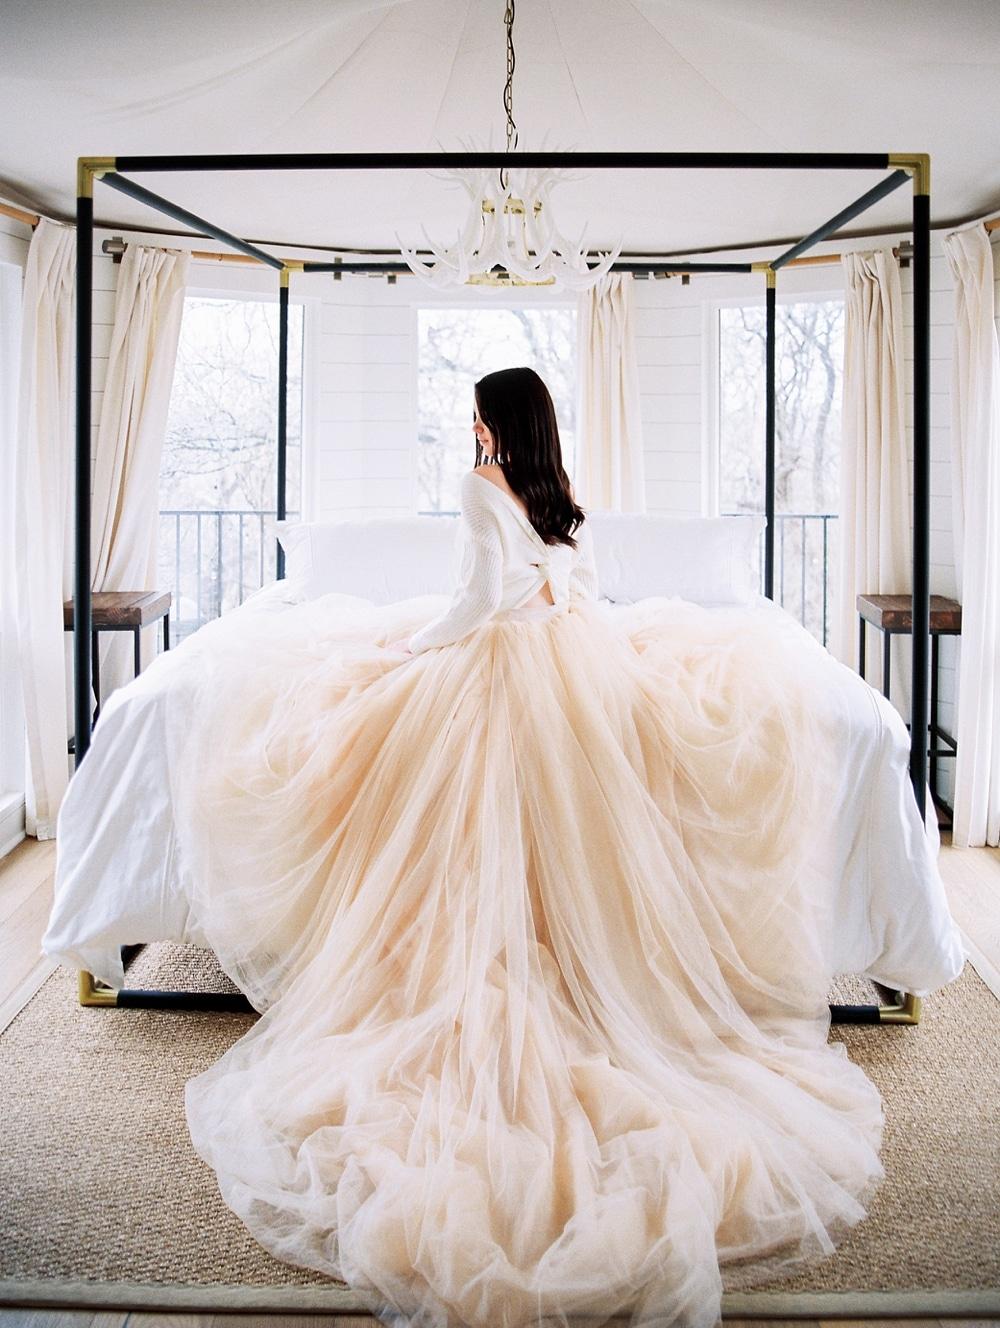 Kristin-La-Voie-Photography-fine-art-wedding-bridal-boudoir-texas-photographer-Dallas-Austin-San-Marcos-wahwahtaysee-resort-1-2